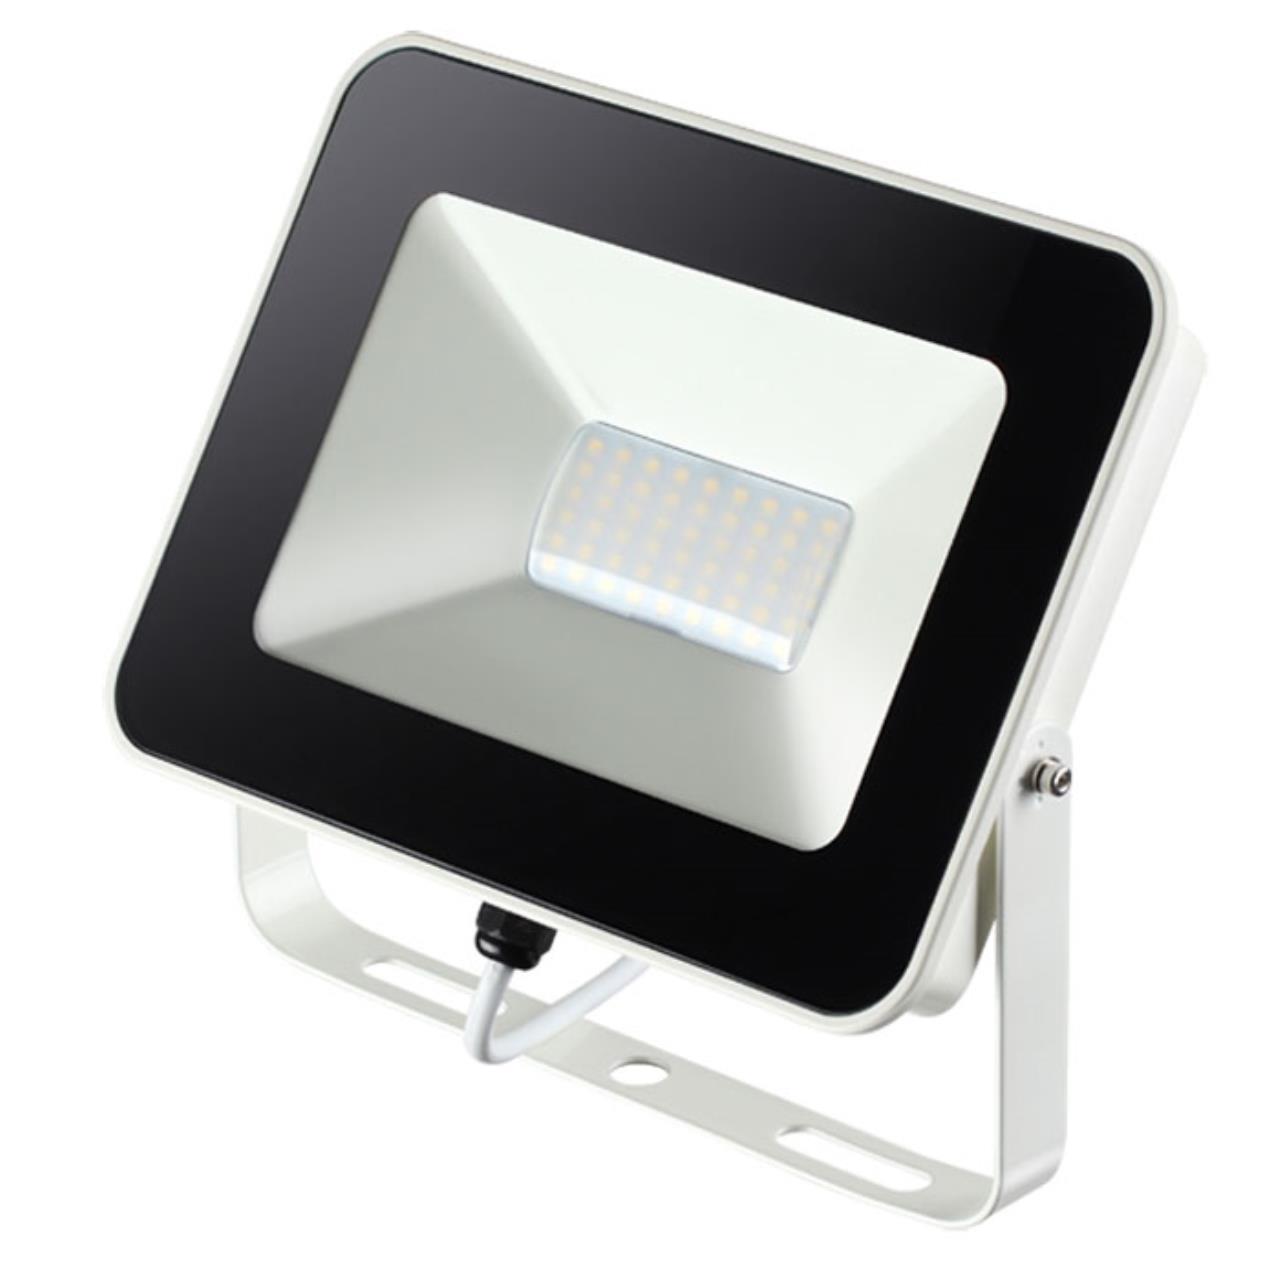 357528 STREET NT18 176 белый Ландшафтный прожектор IP65 LED 4000K 30W 220-240V ARMIN